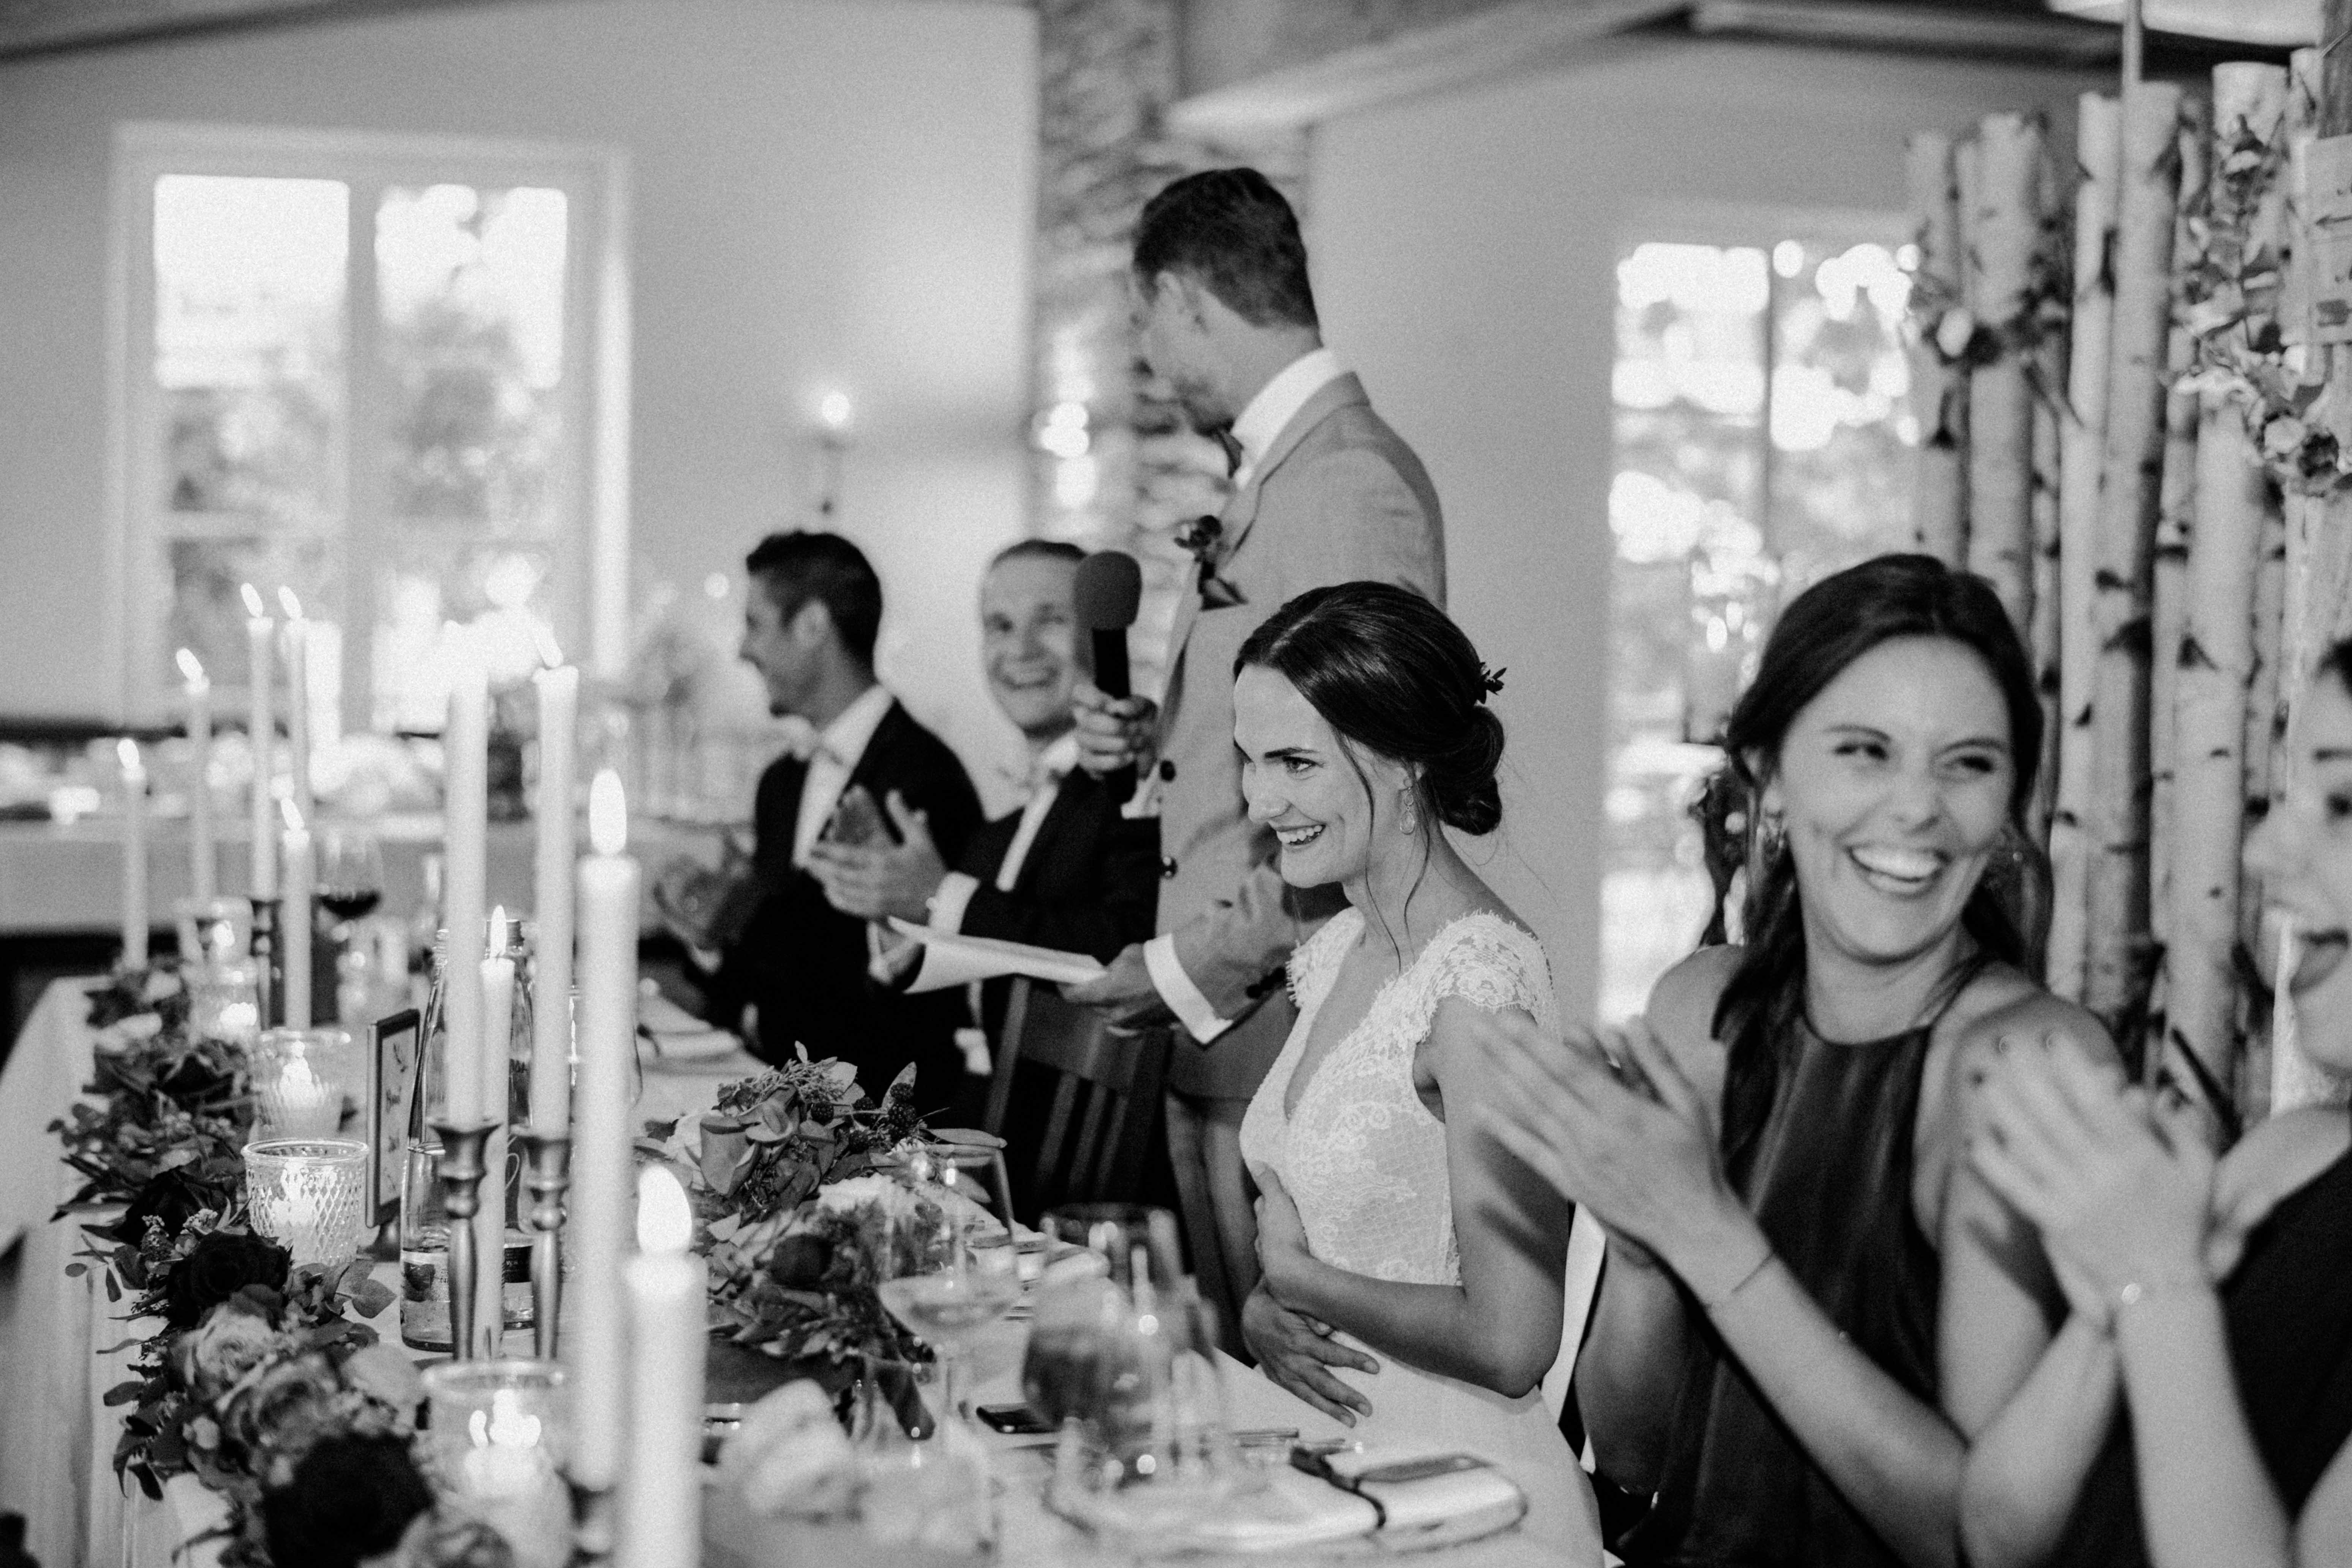 happy faces sonja poehlmann photography wedding muenchen bayern